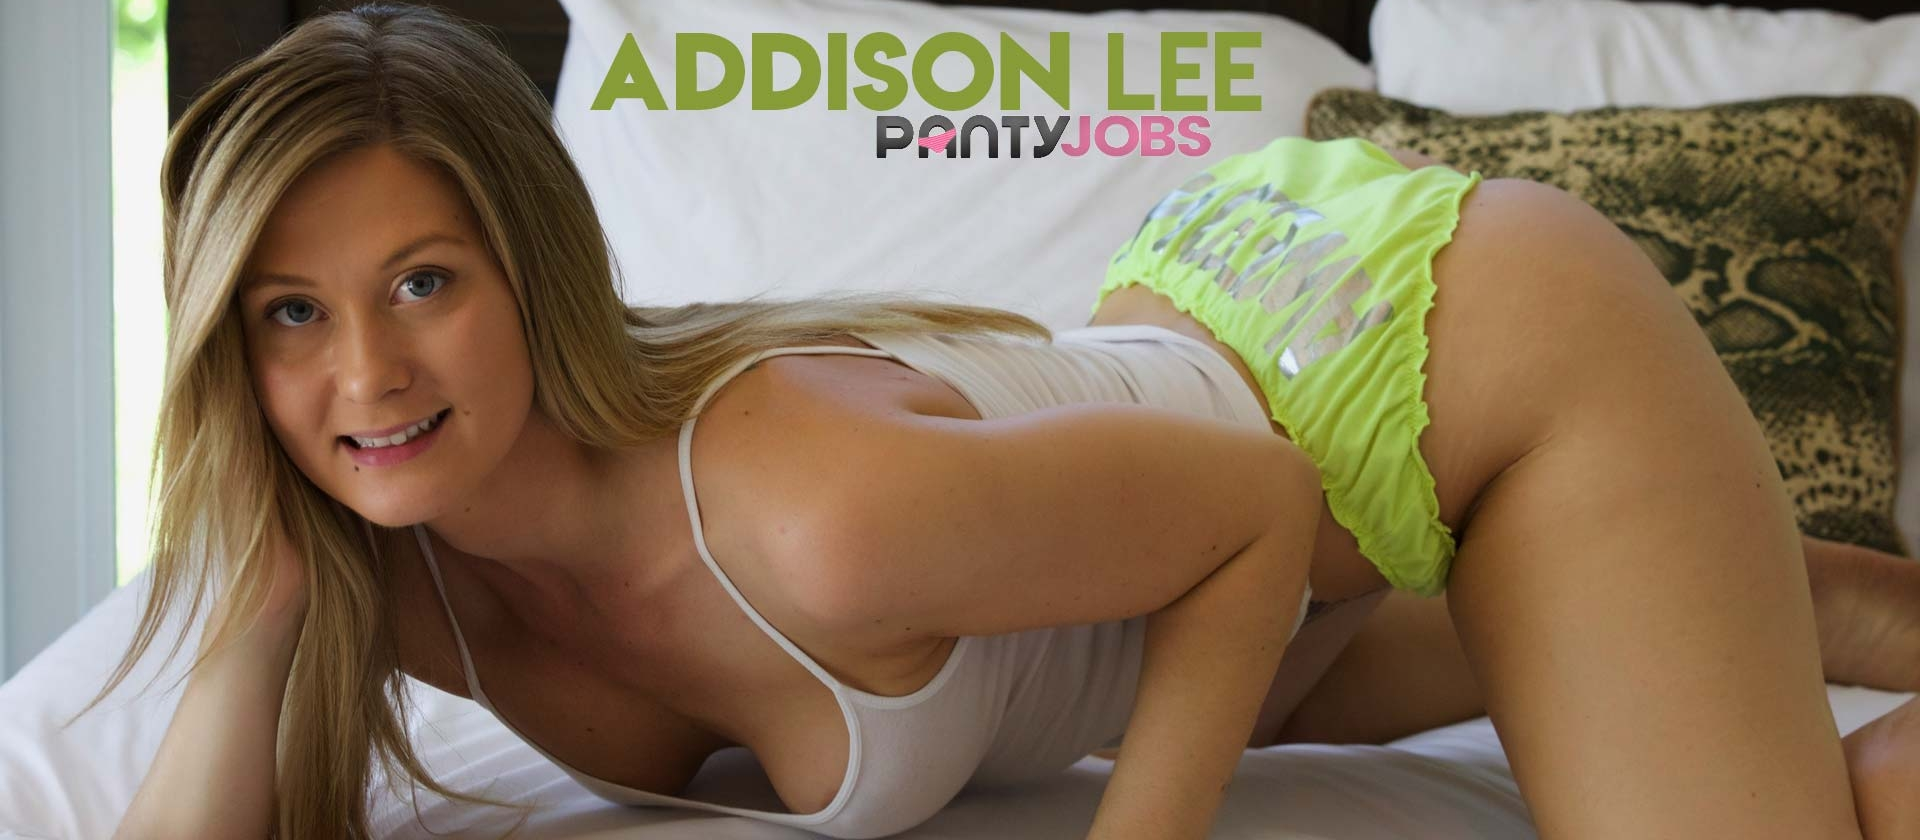 Addison Lee Gives A Pantyjob